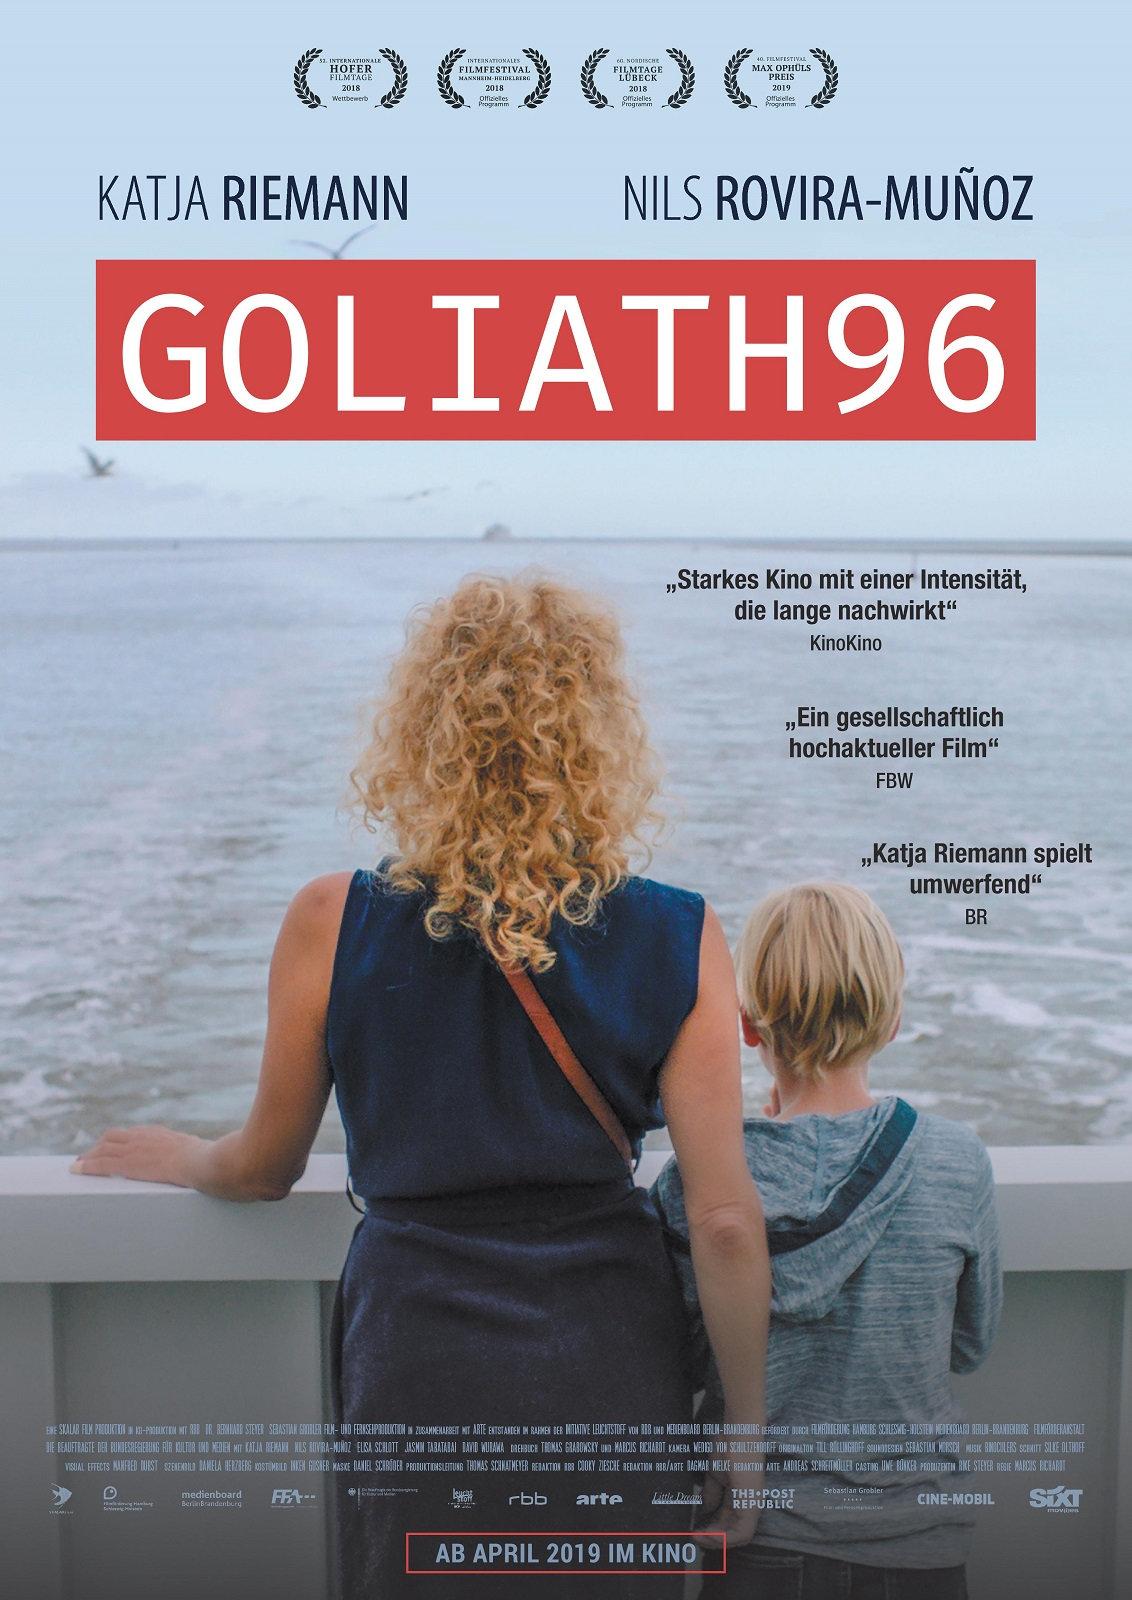 affiche du film Goliath 96